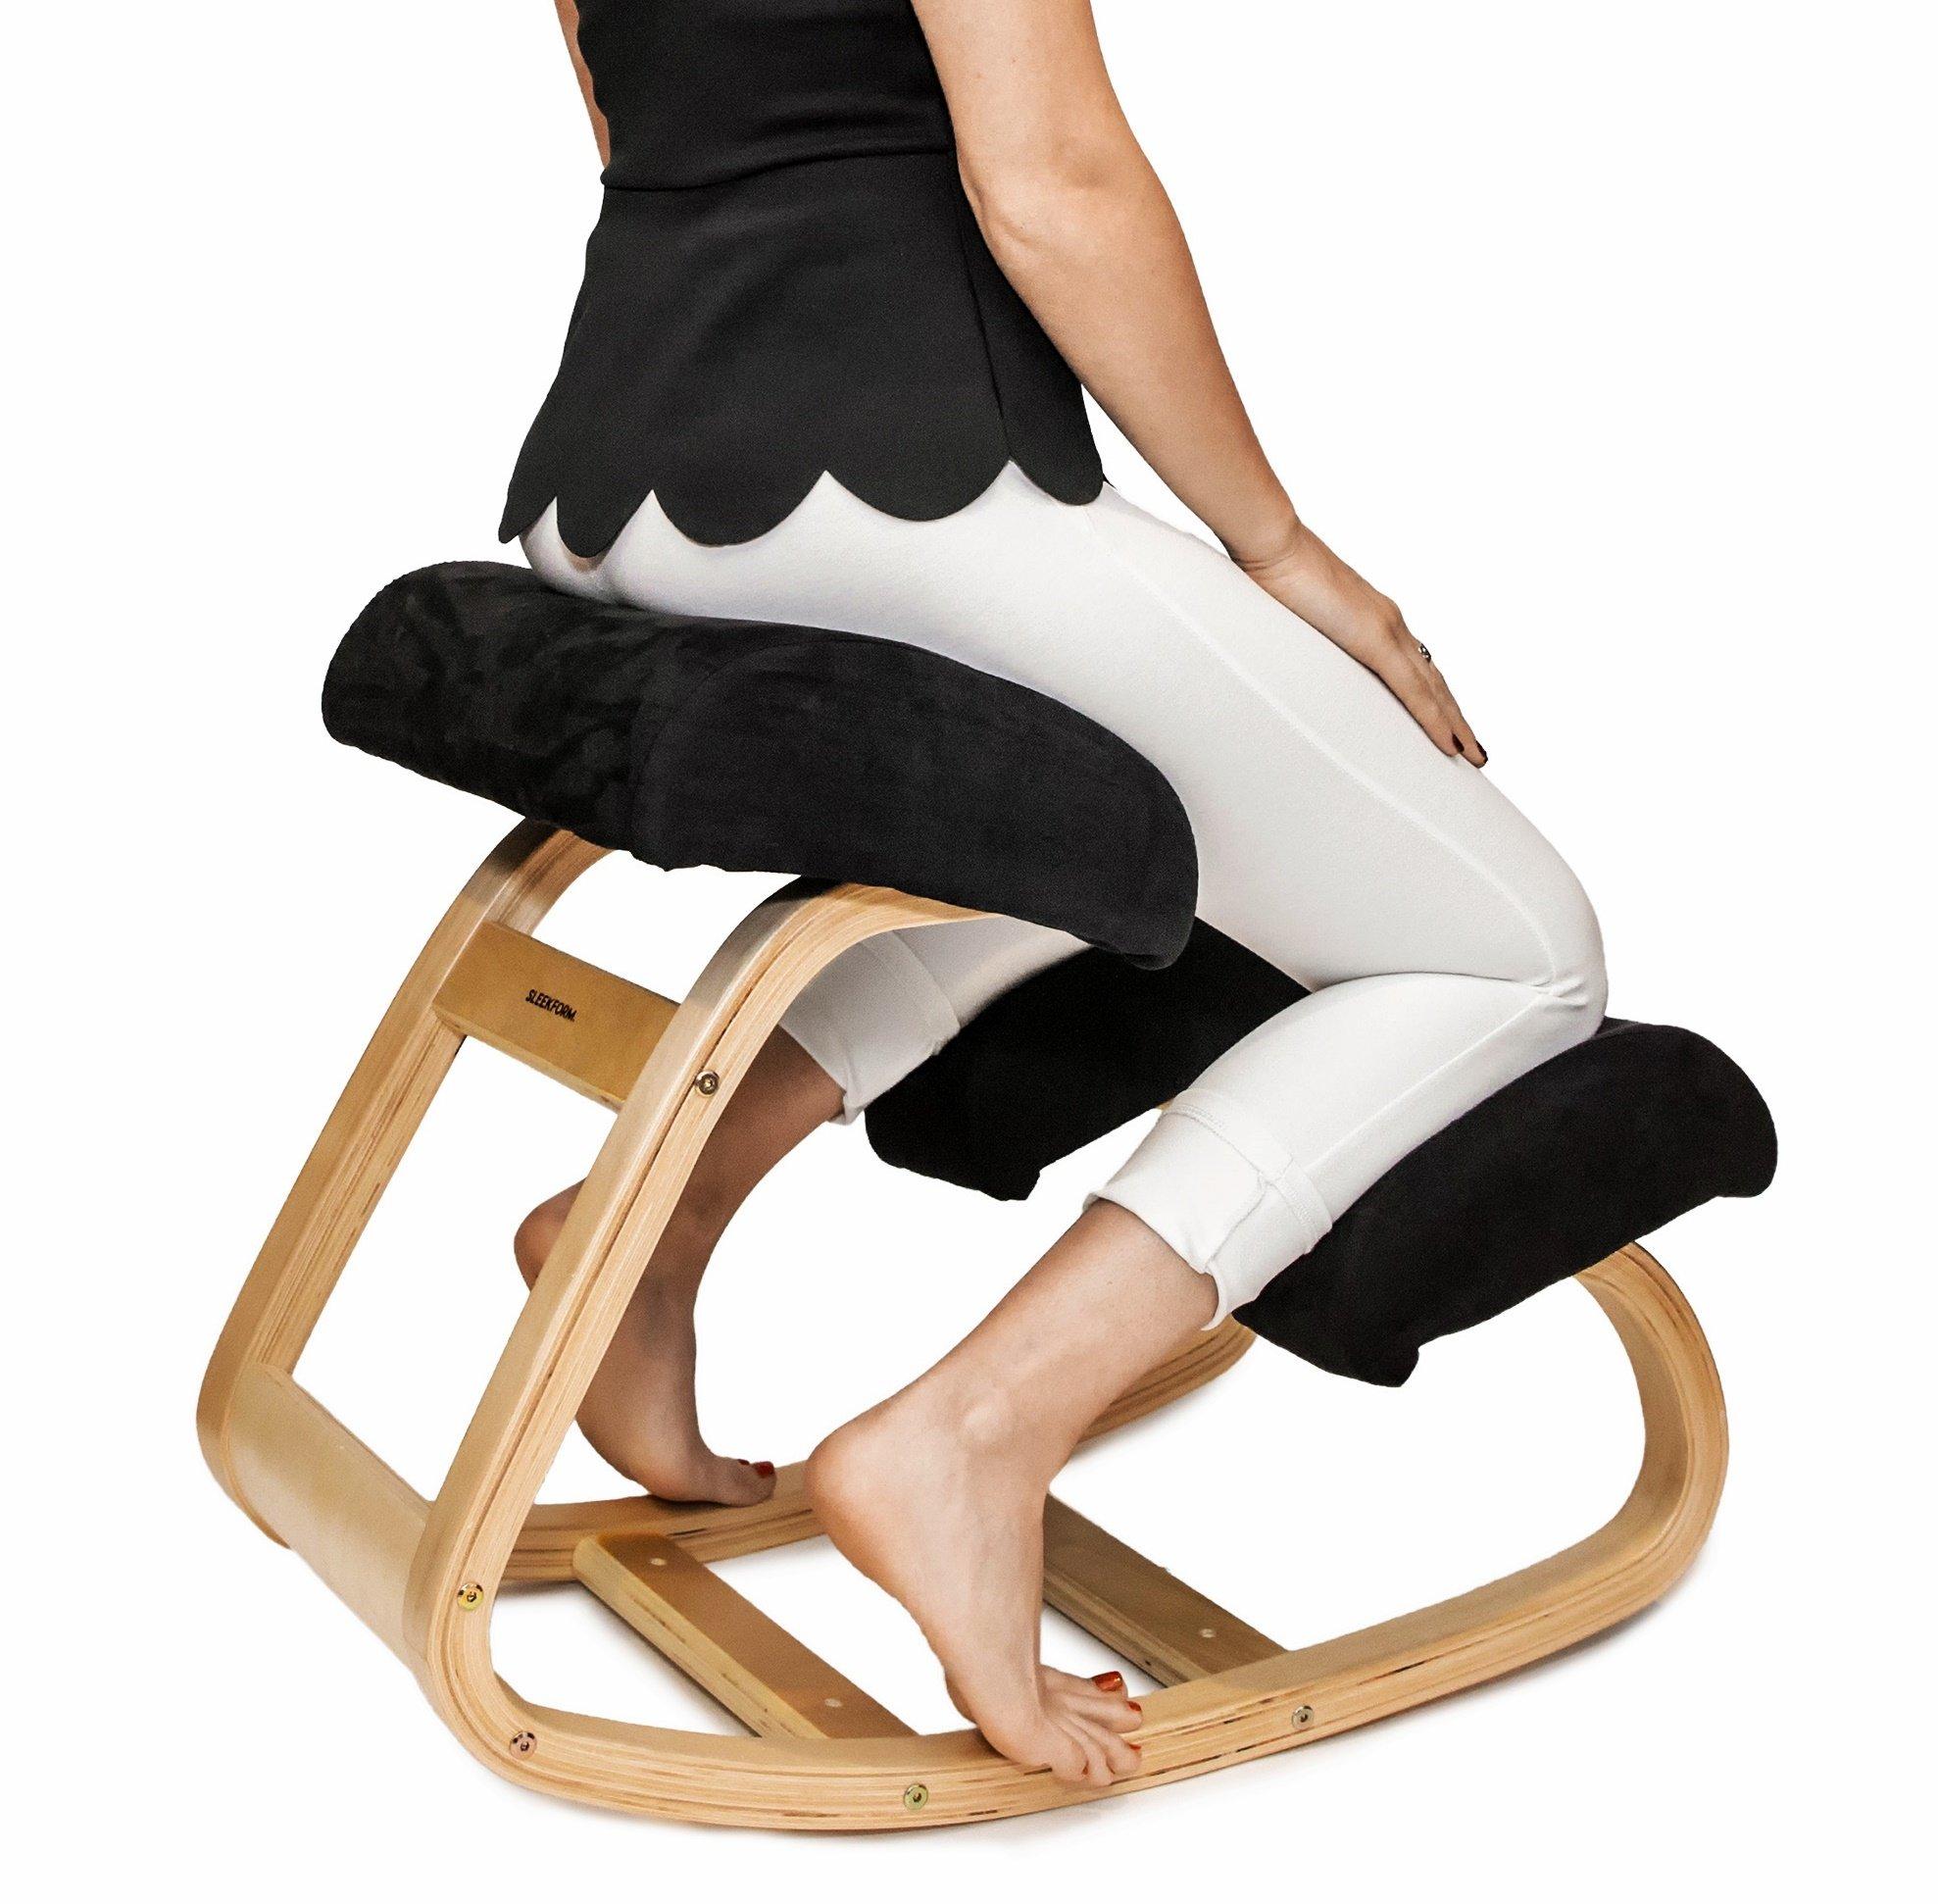 Desk Office Ergonomic Rocking Kneeling Chair Orthopaedic